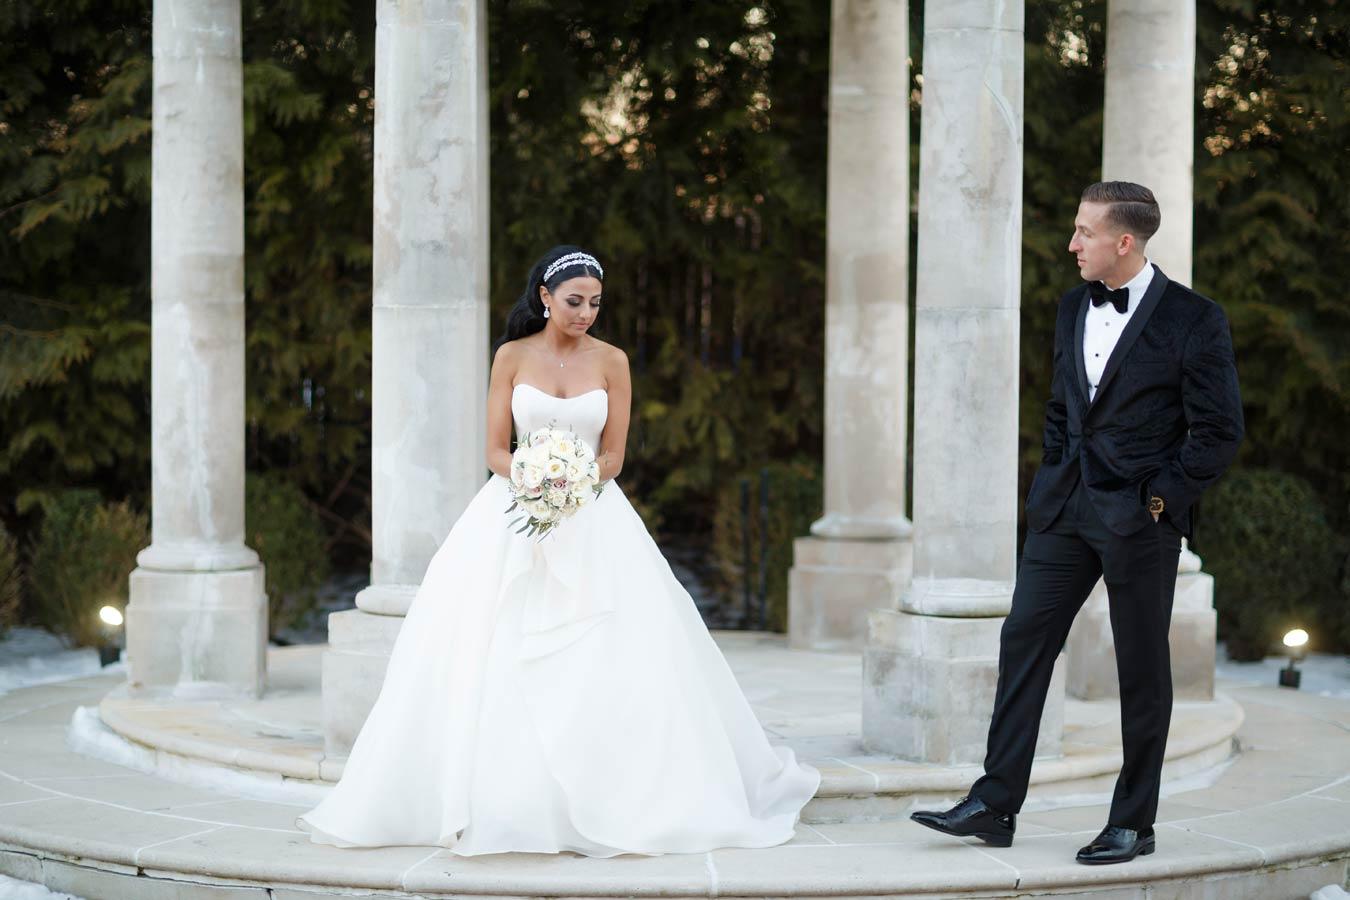 florentine-gardens-wedding-photographer-new-jersey0125.jpg